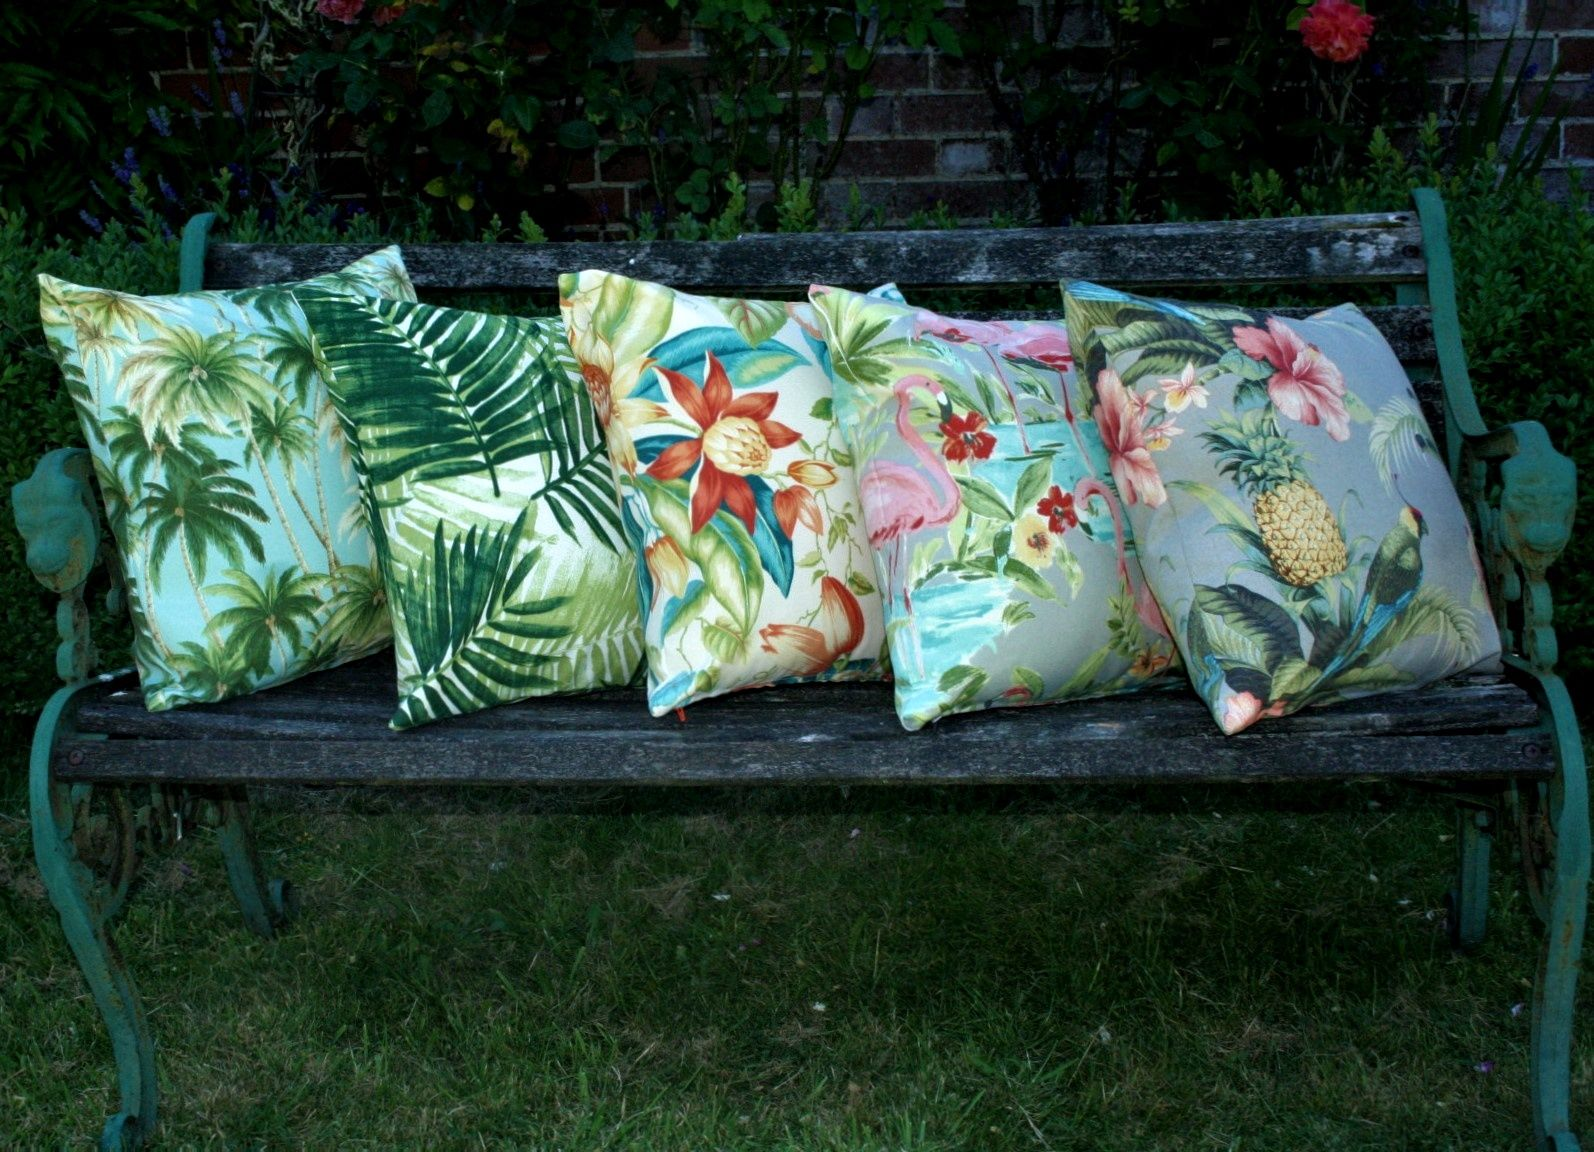 15ragged-rose-ltd_showerproof-garden-cushions.jpg